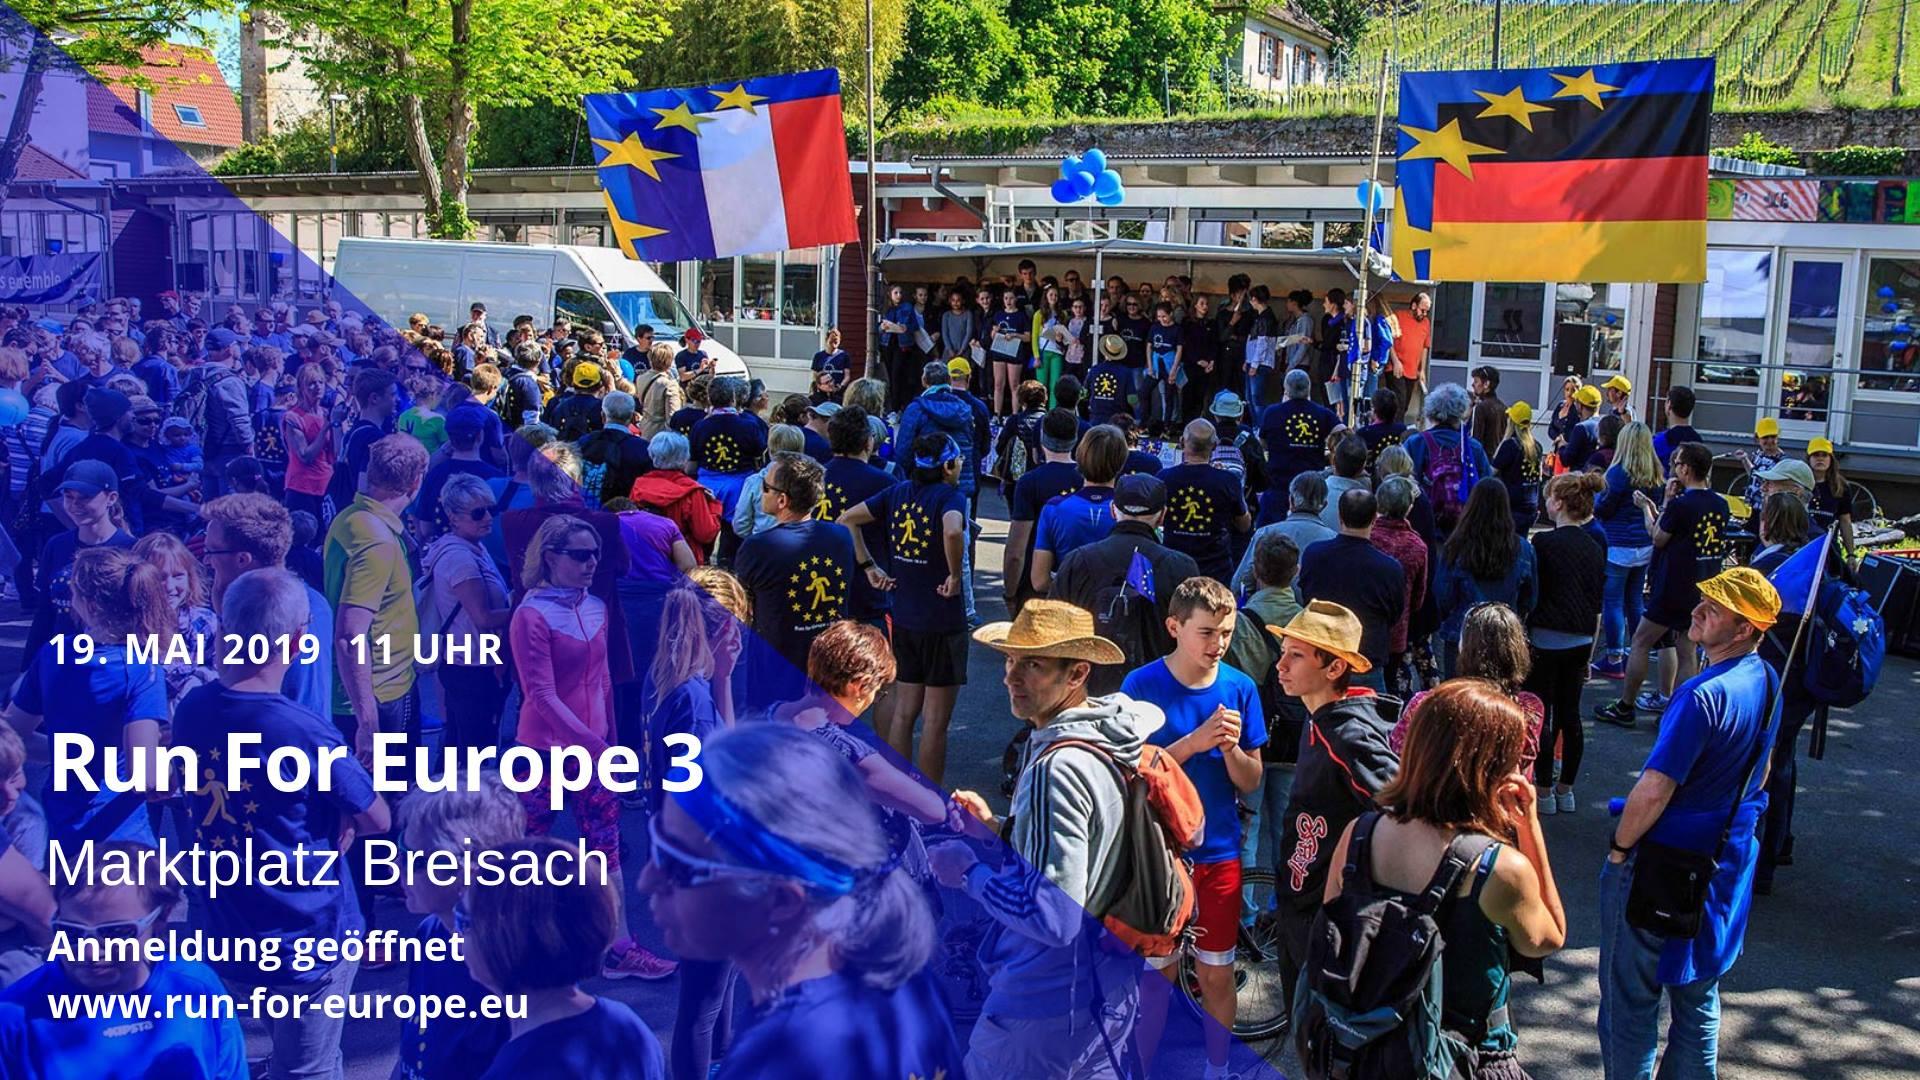 Run for Europe 3